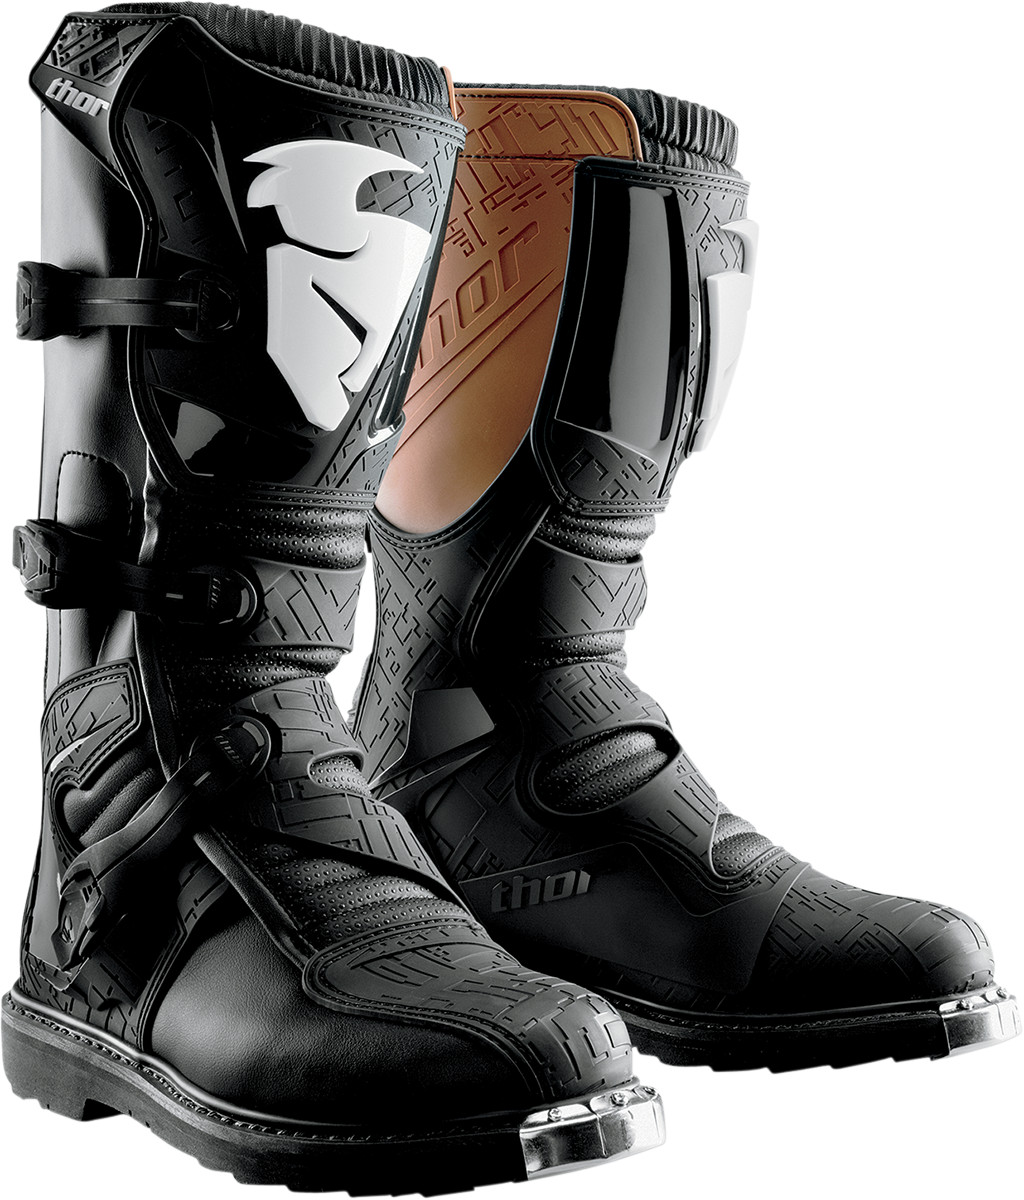 Thor S4 Blitz ATV Boots